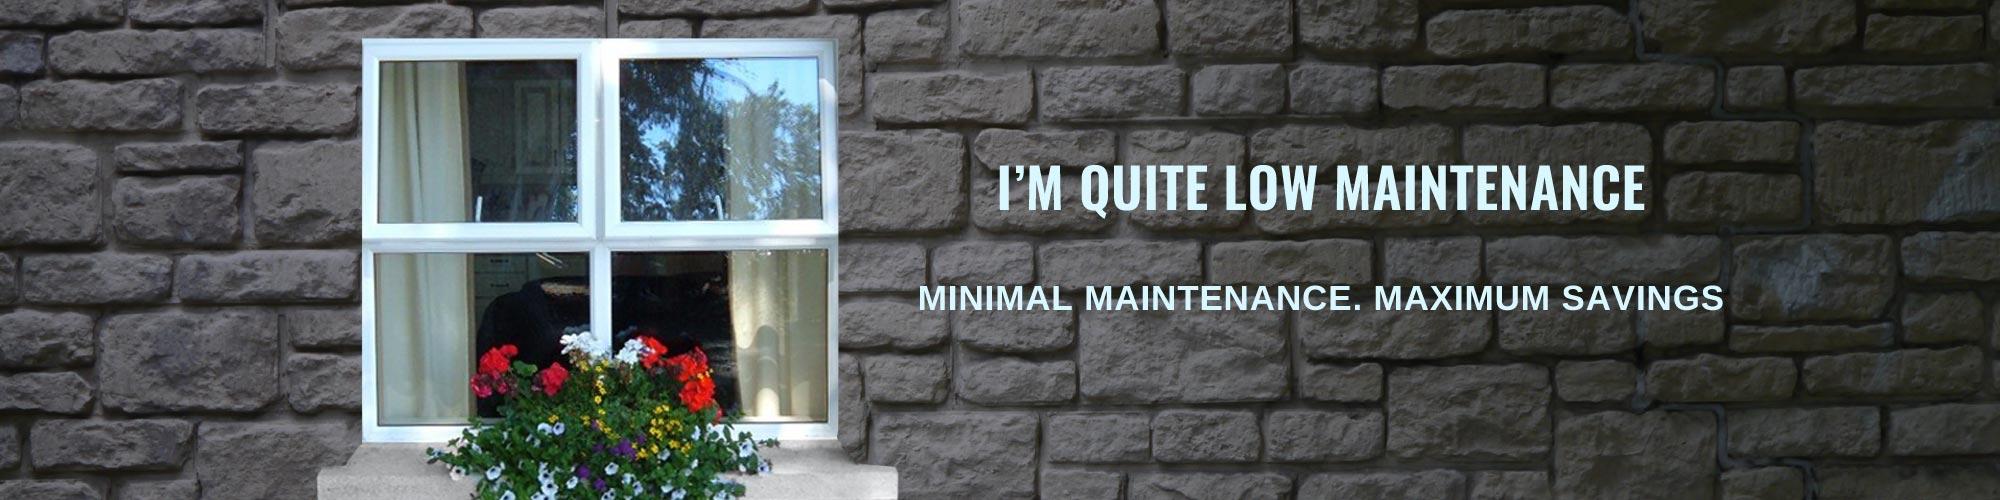 minimal-maintanance